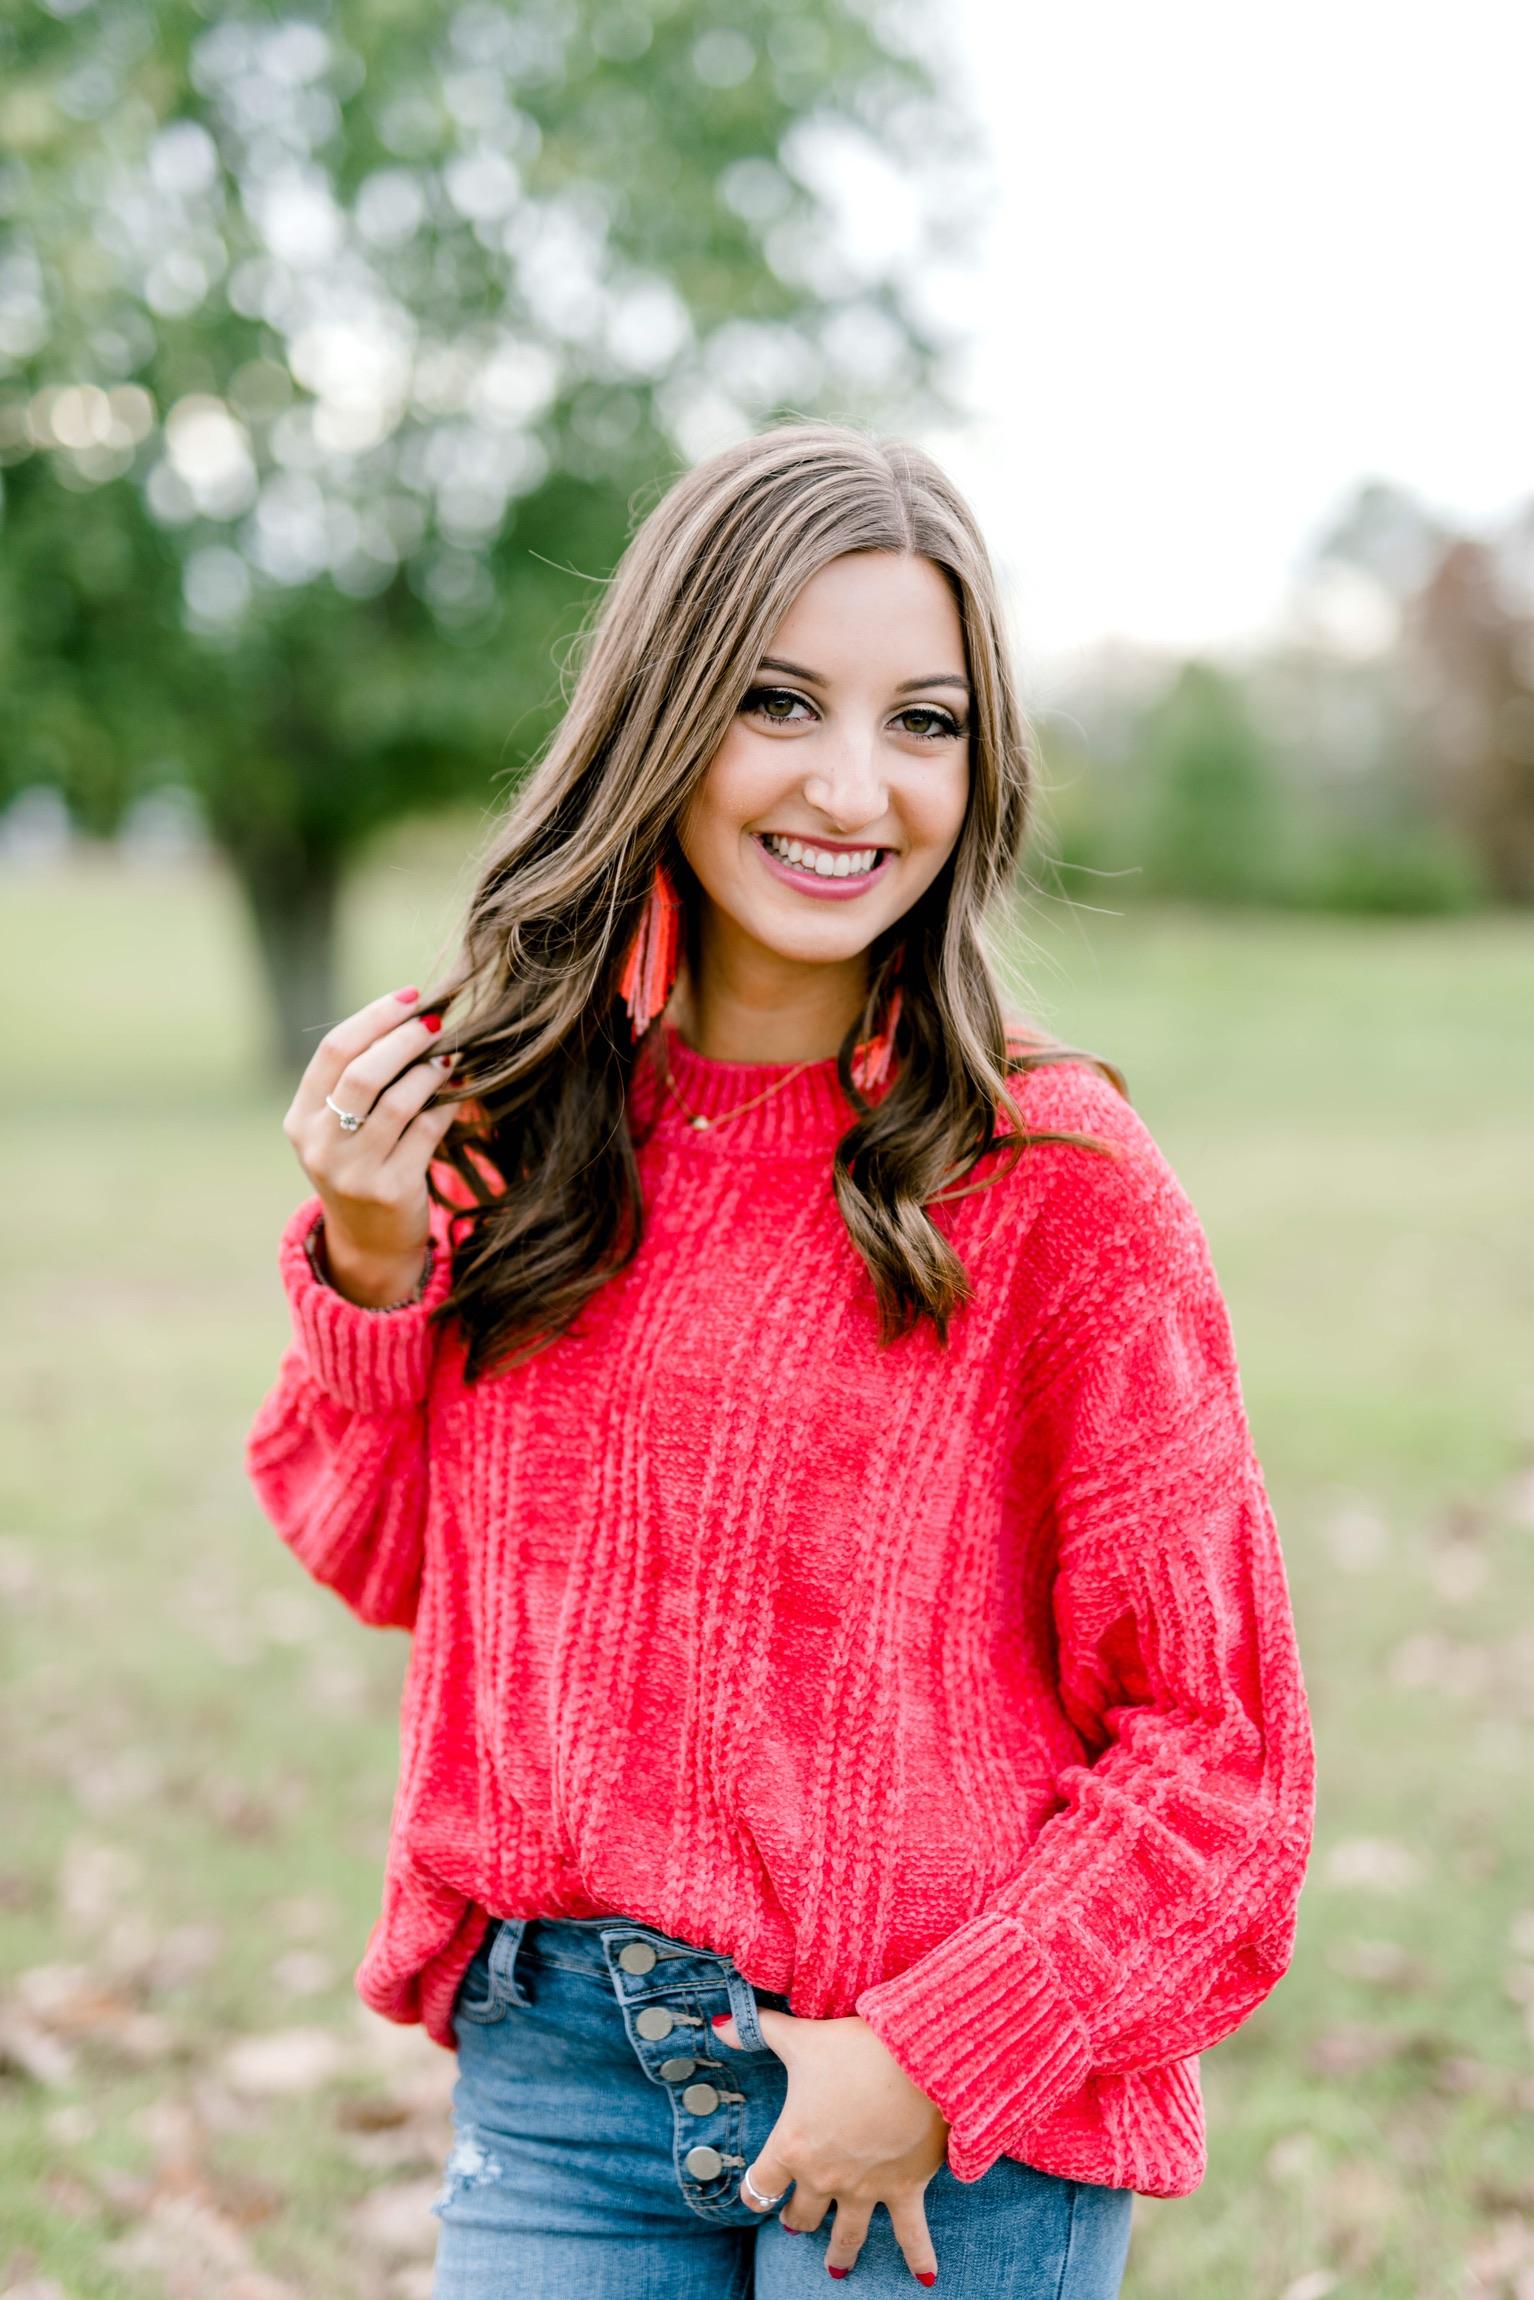 Abby Morrison